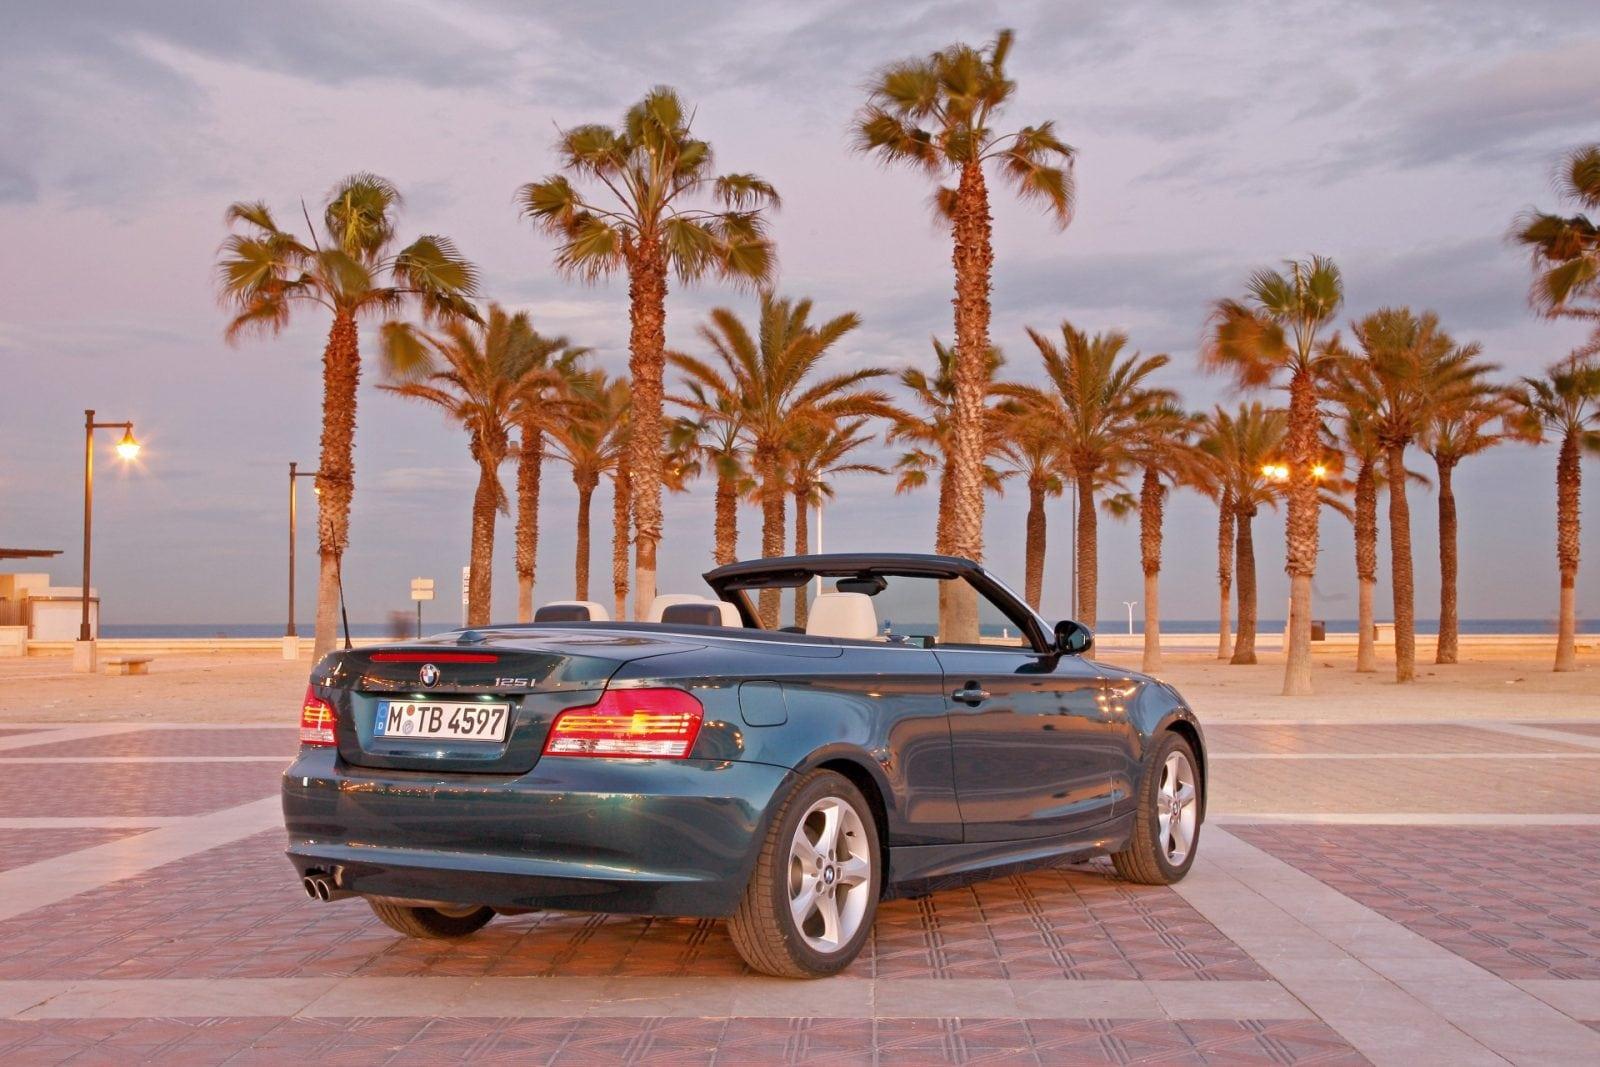 BMW 1 Series E88 Convertible